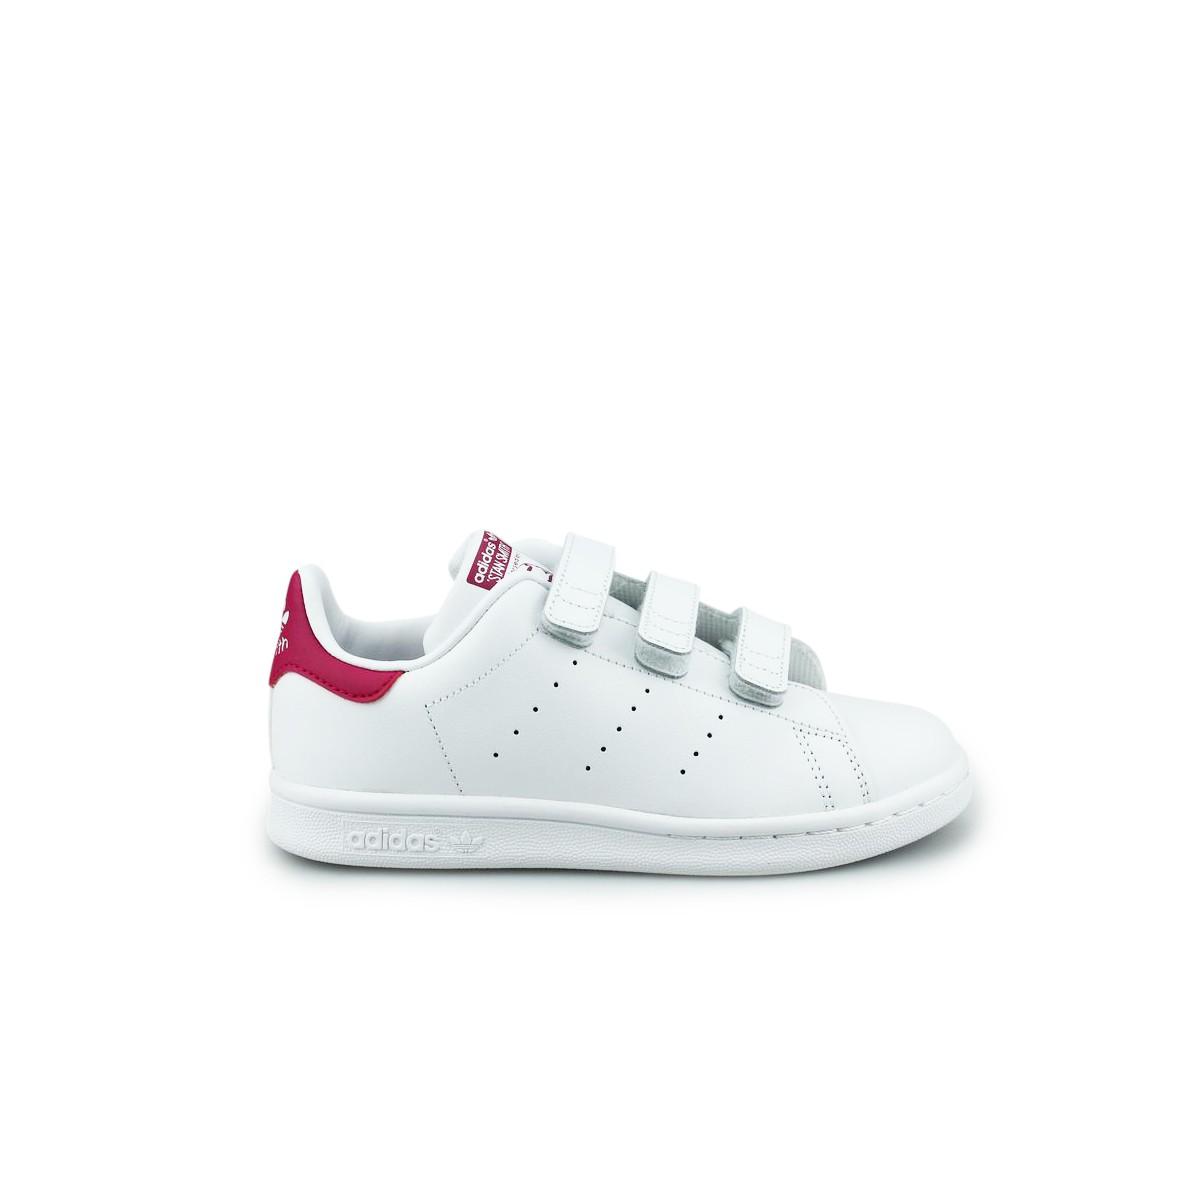 adidas dragon rose et blanche